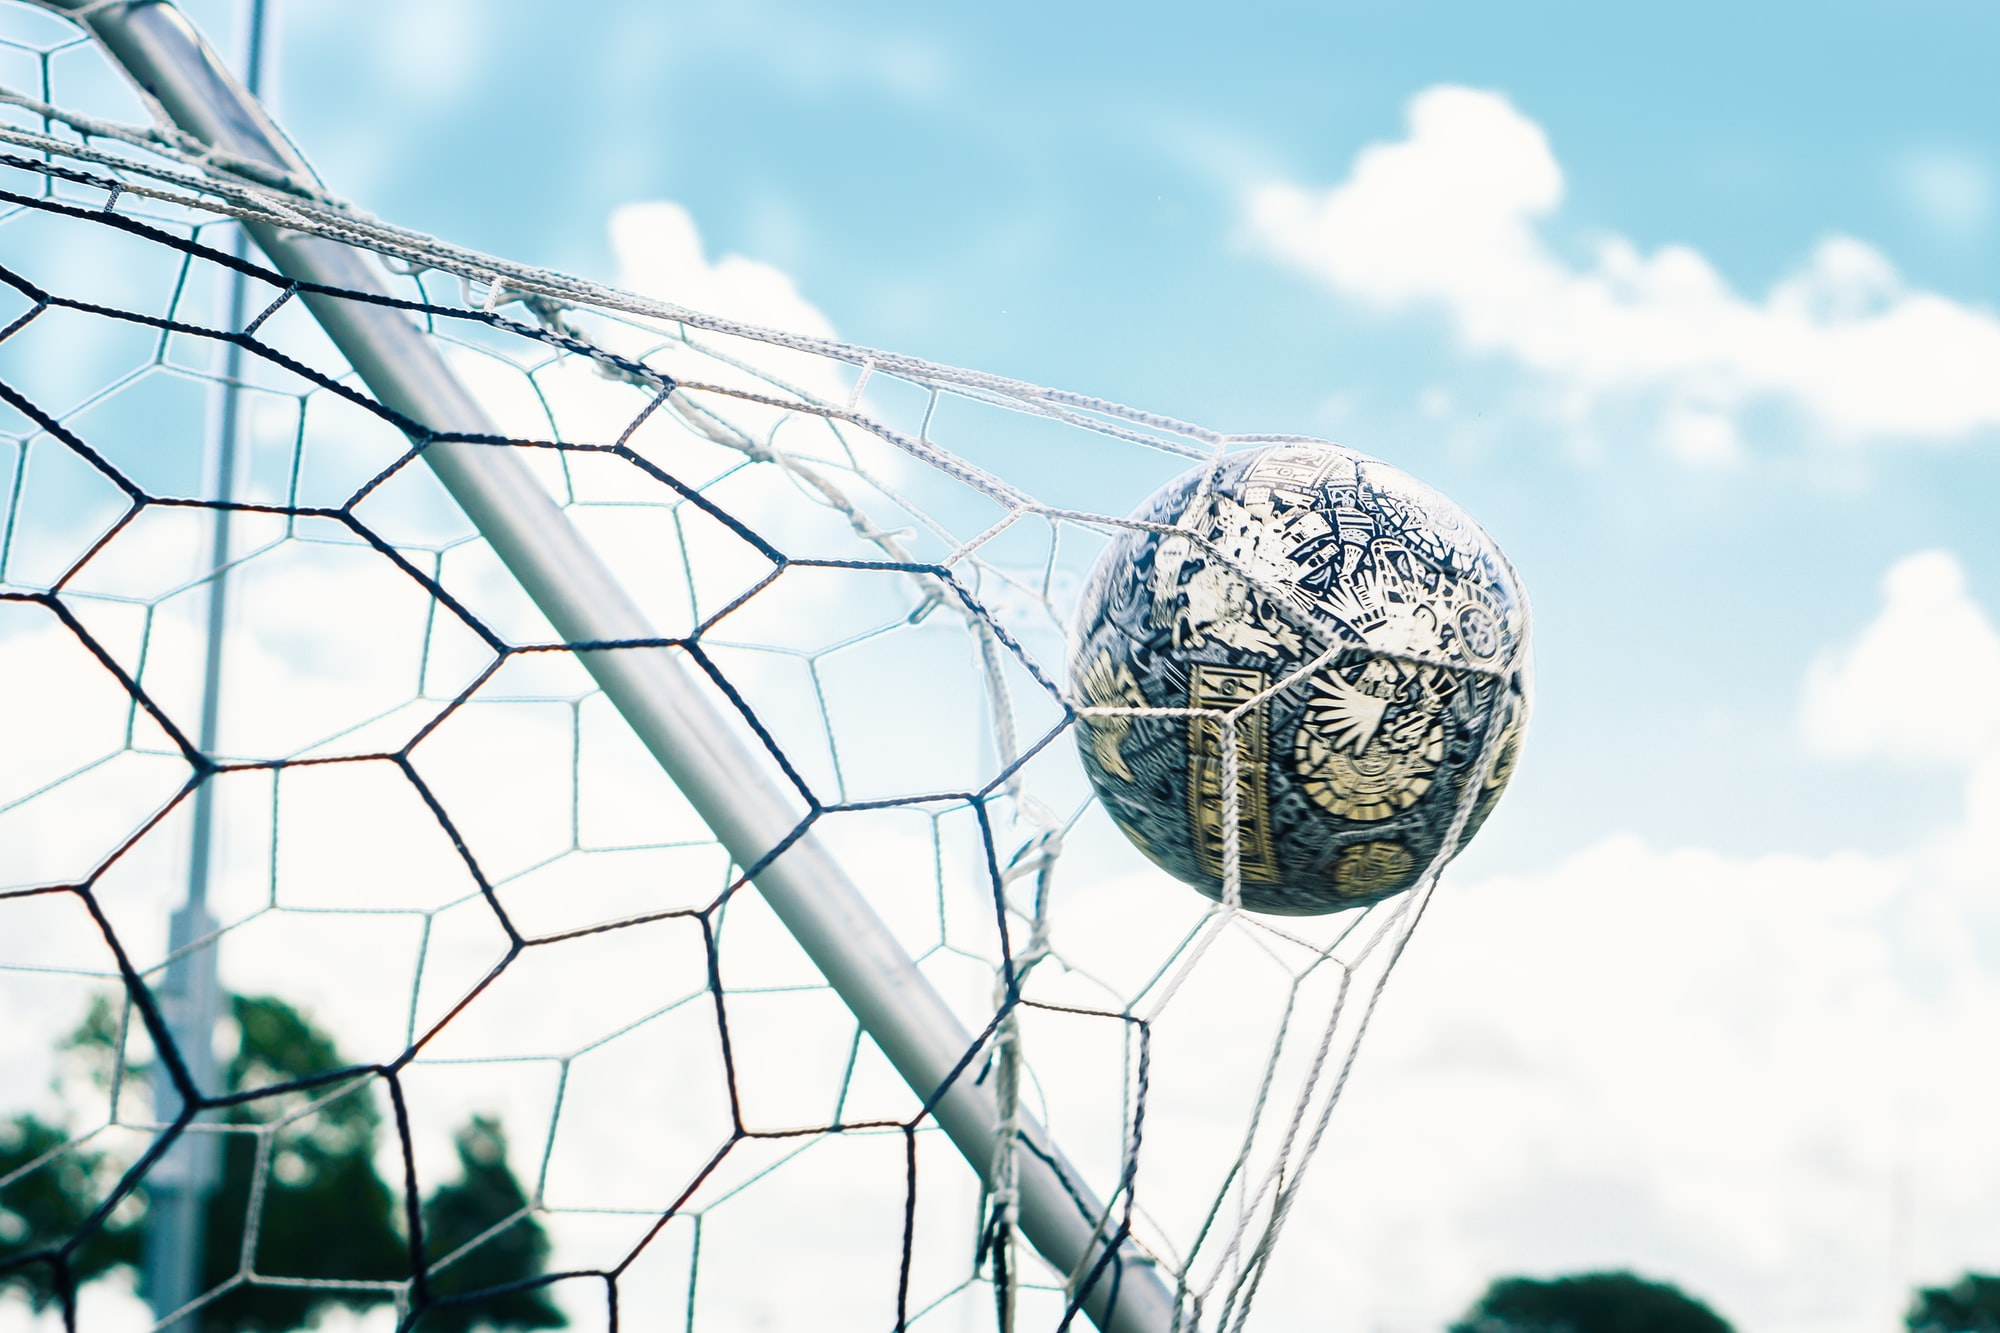 Finale Nations League 2021: Spagna-Francia 20:45 10/10/2021